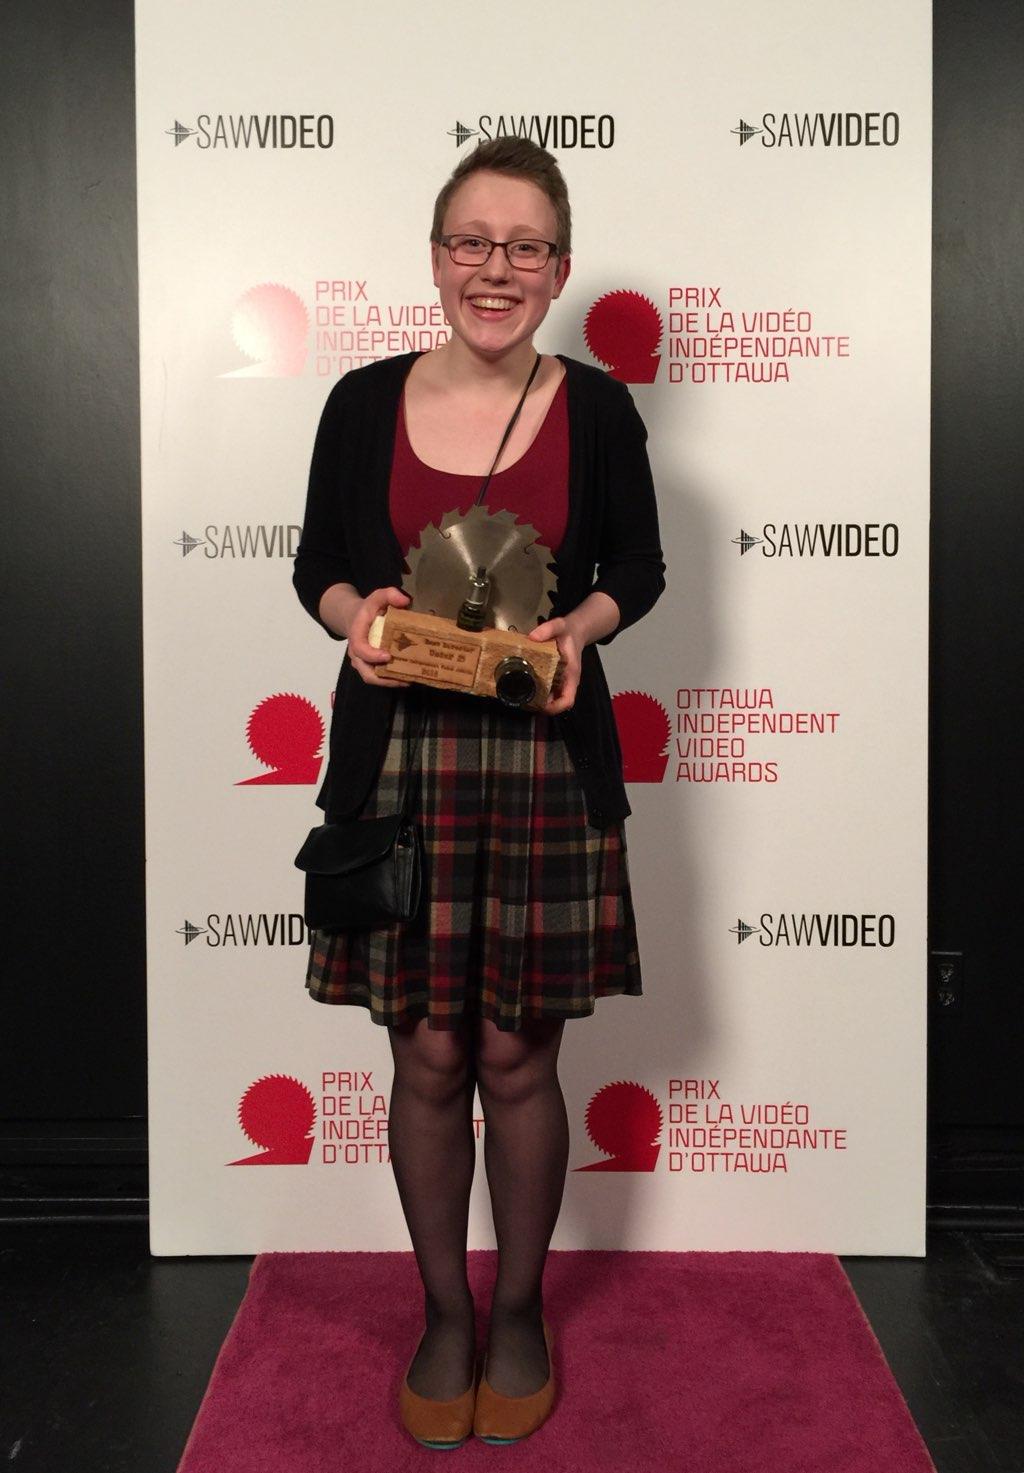 Morgana receiving her award at the OIVA gala